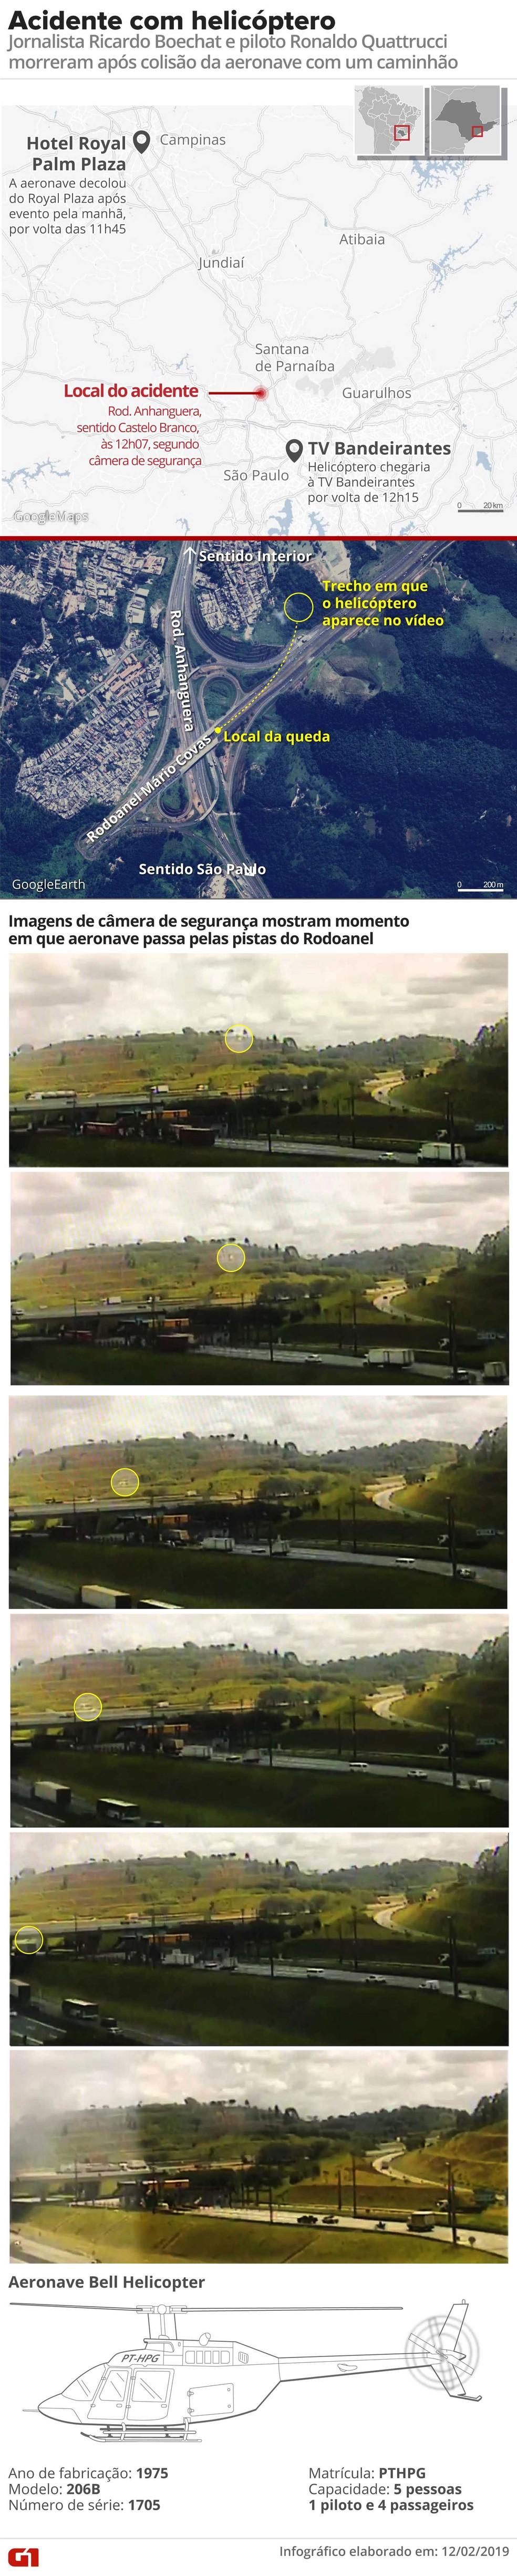 Arte mostra como foi o acidente como helicóptero â?? Foto: Juliane Santos/Editoria de Arte/G1